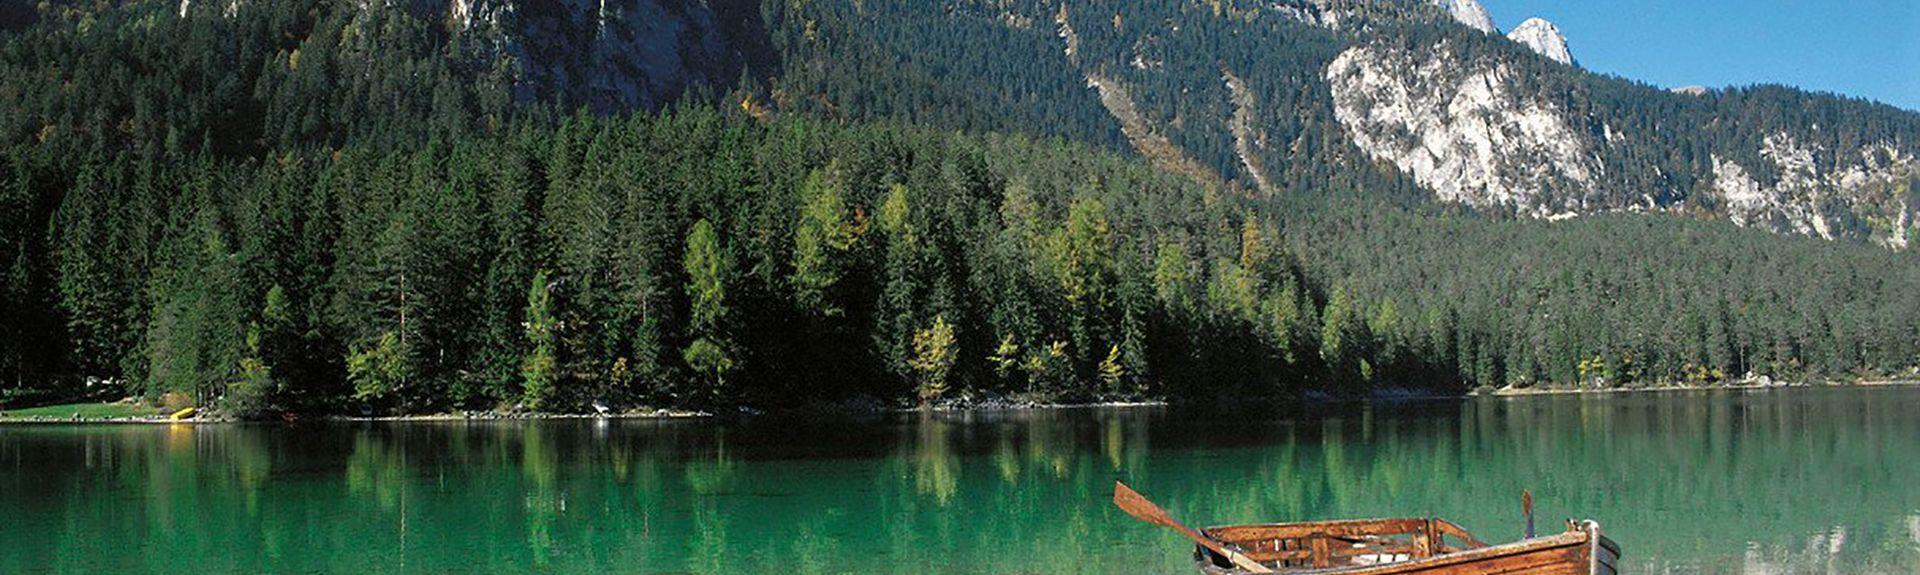 Terlago, Trentino-Alto Adige, Itália